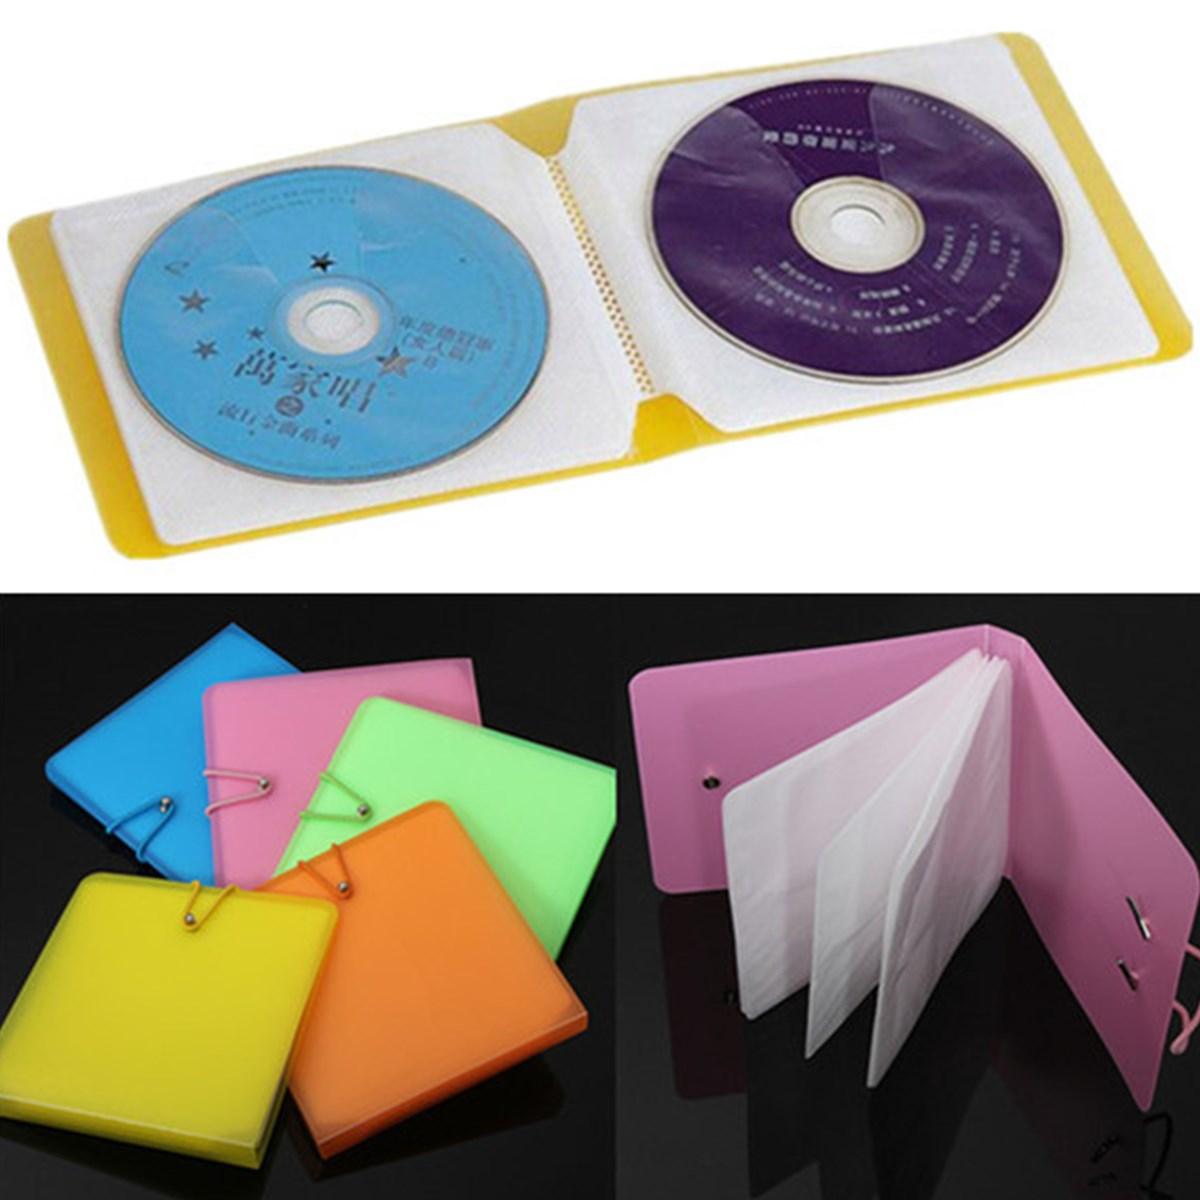 New 12 Disc Platics  Album Box For CD VCD DVD Portable Wallet Storage Holder Bag Hard Case Boxes Holder Organizer Carry Case